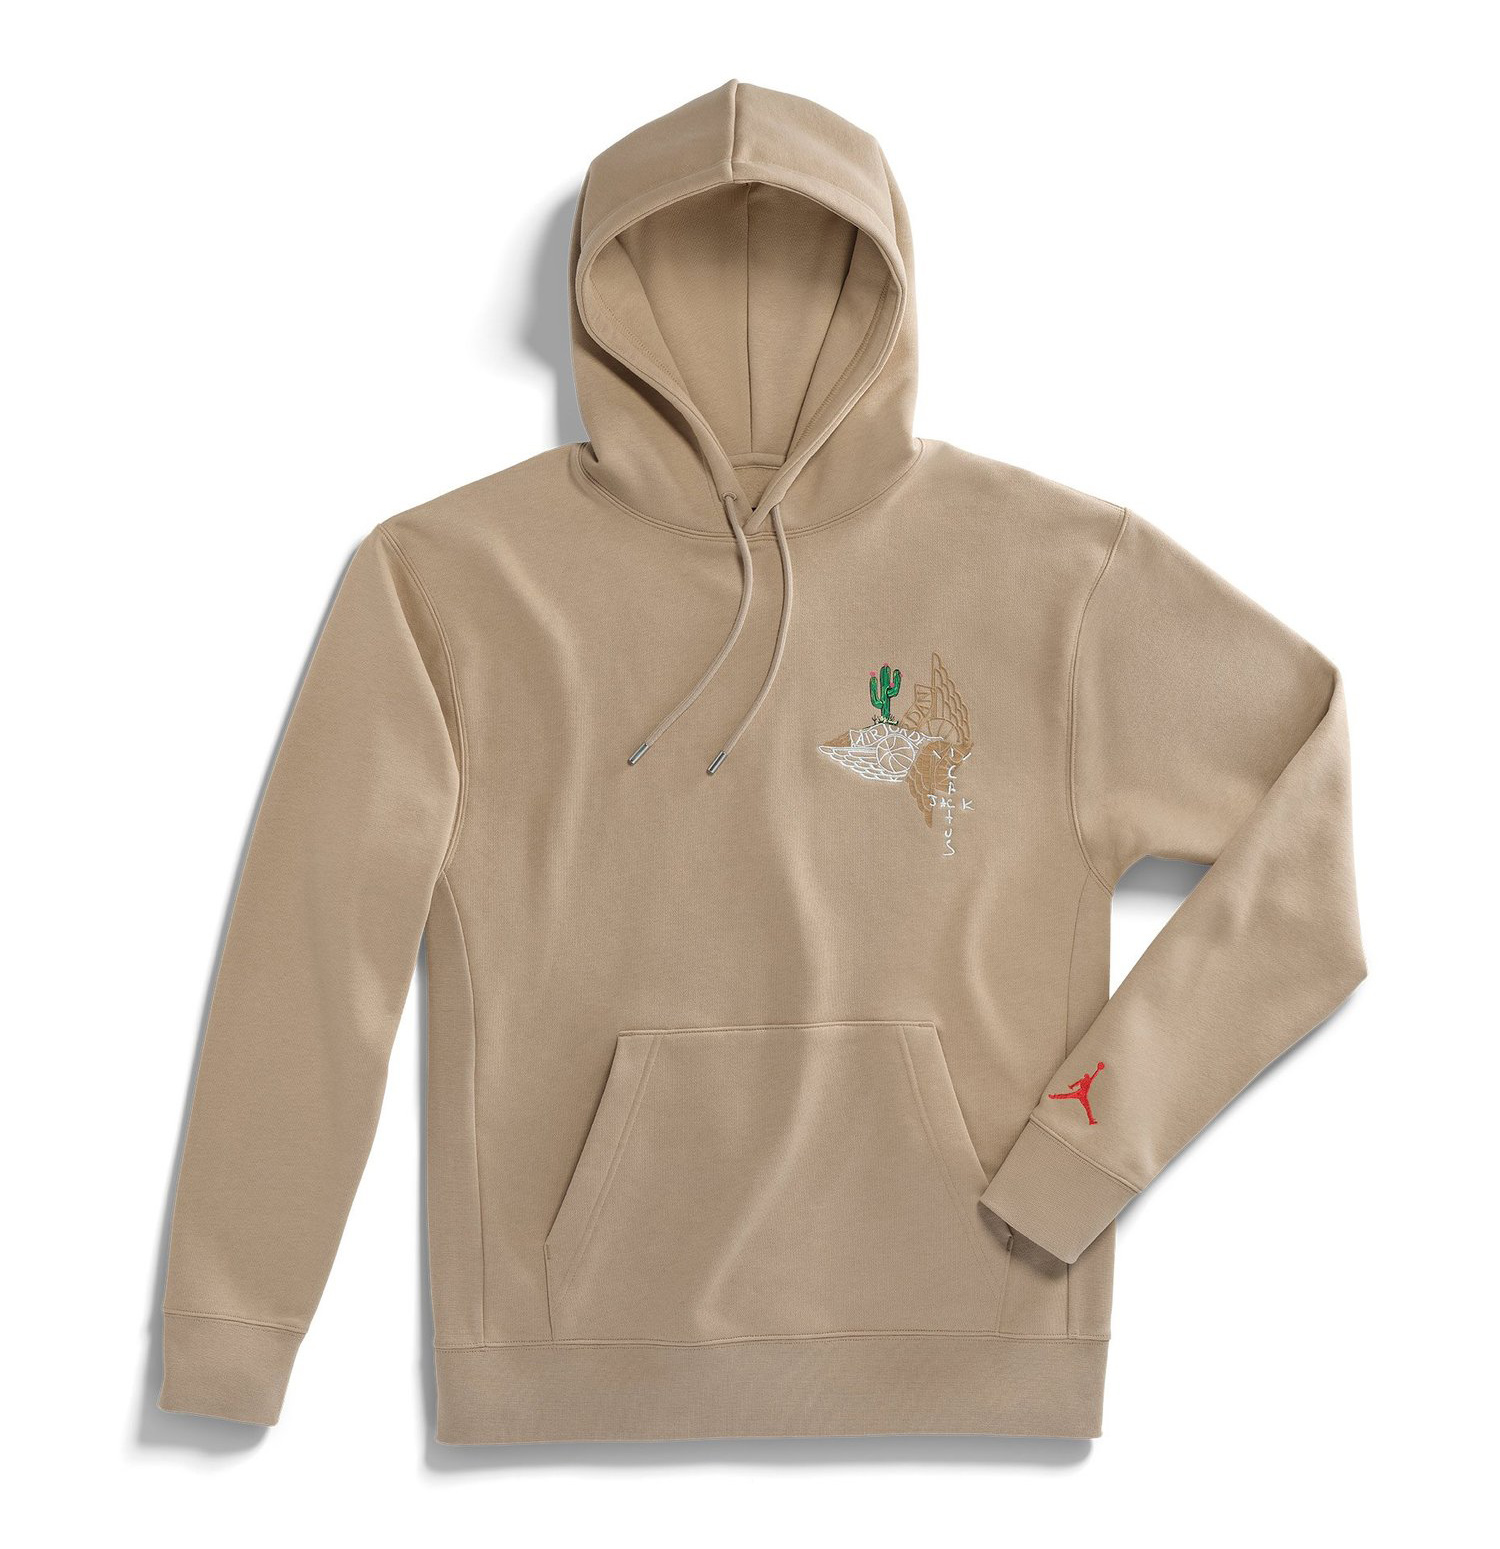 travis-scott-air-jordan-6-british-khaki-hoodie-1